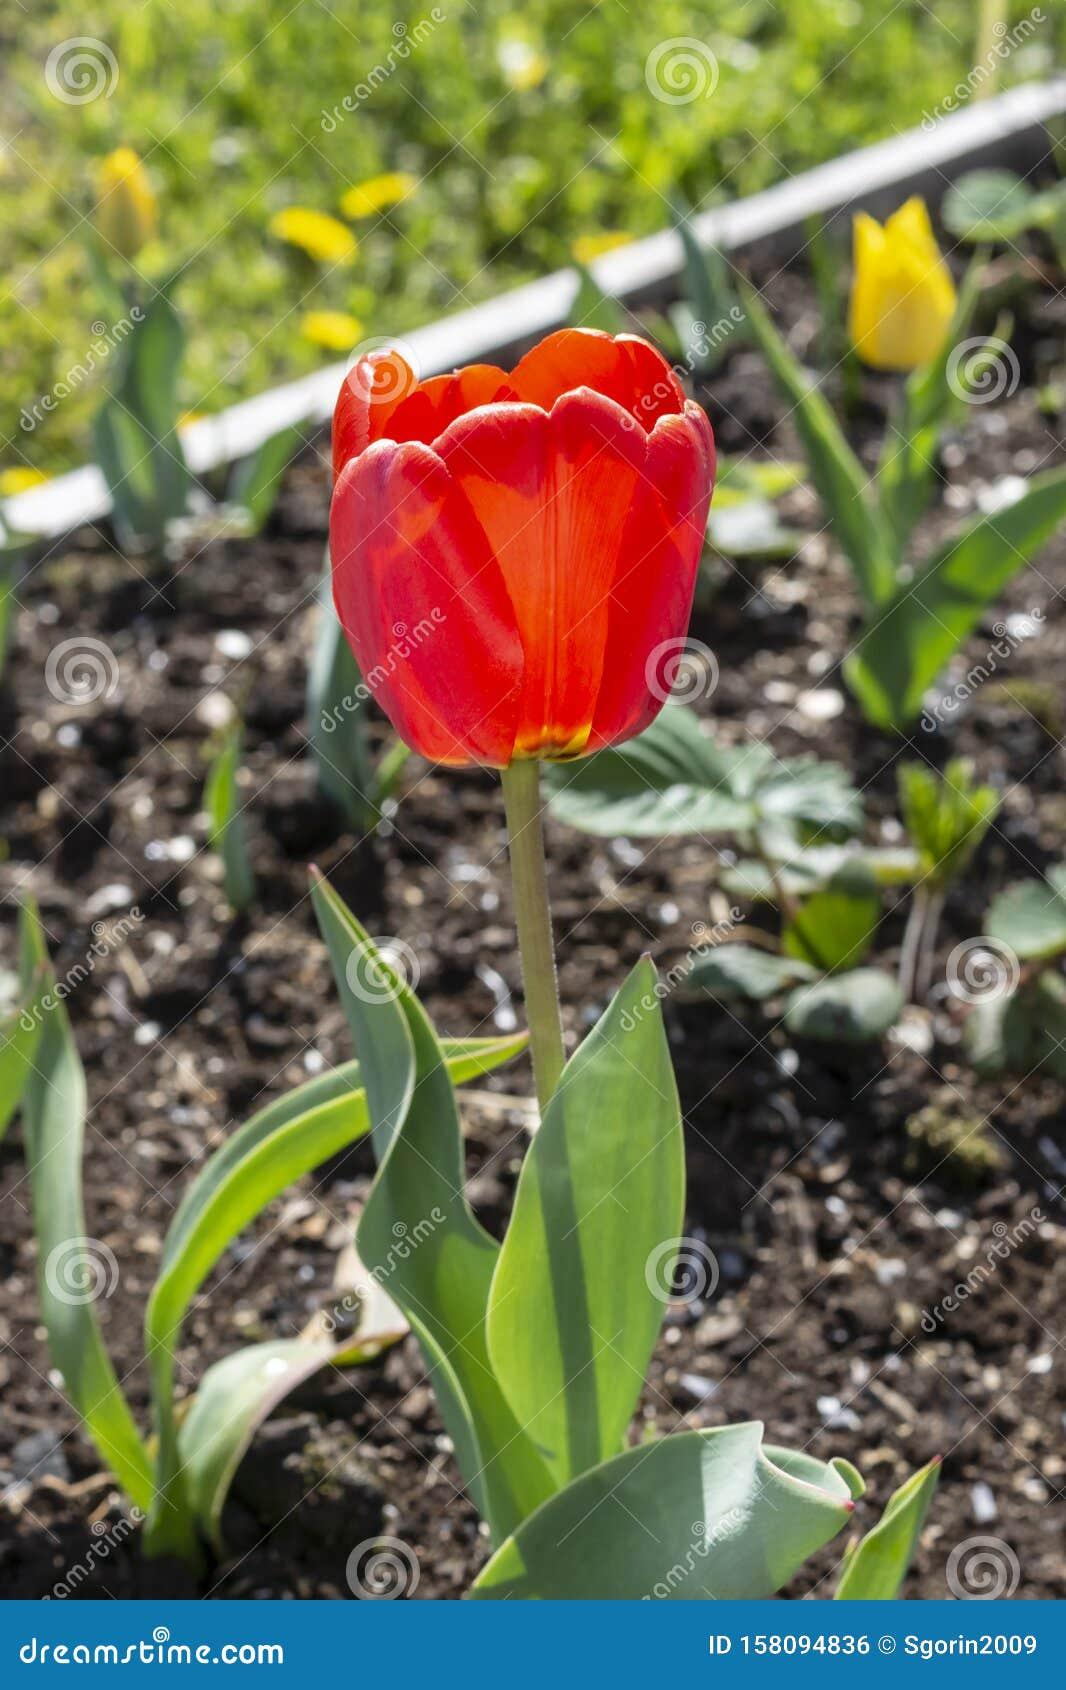 Nice Red Tulip Flower Growing In Garden Bed Ground Stock Photo